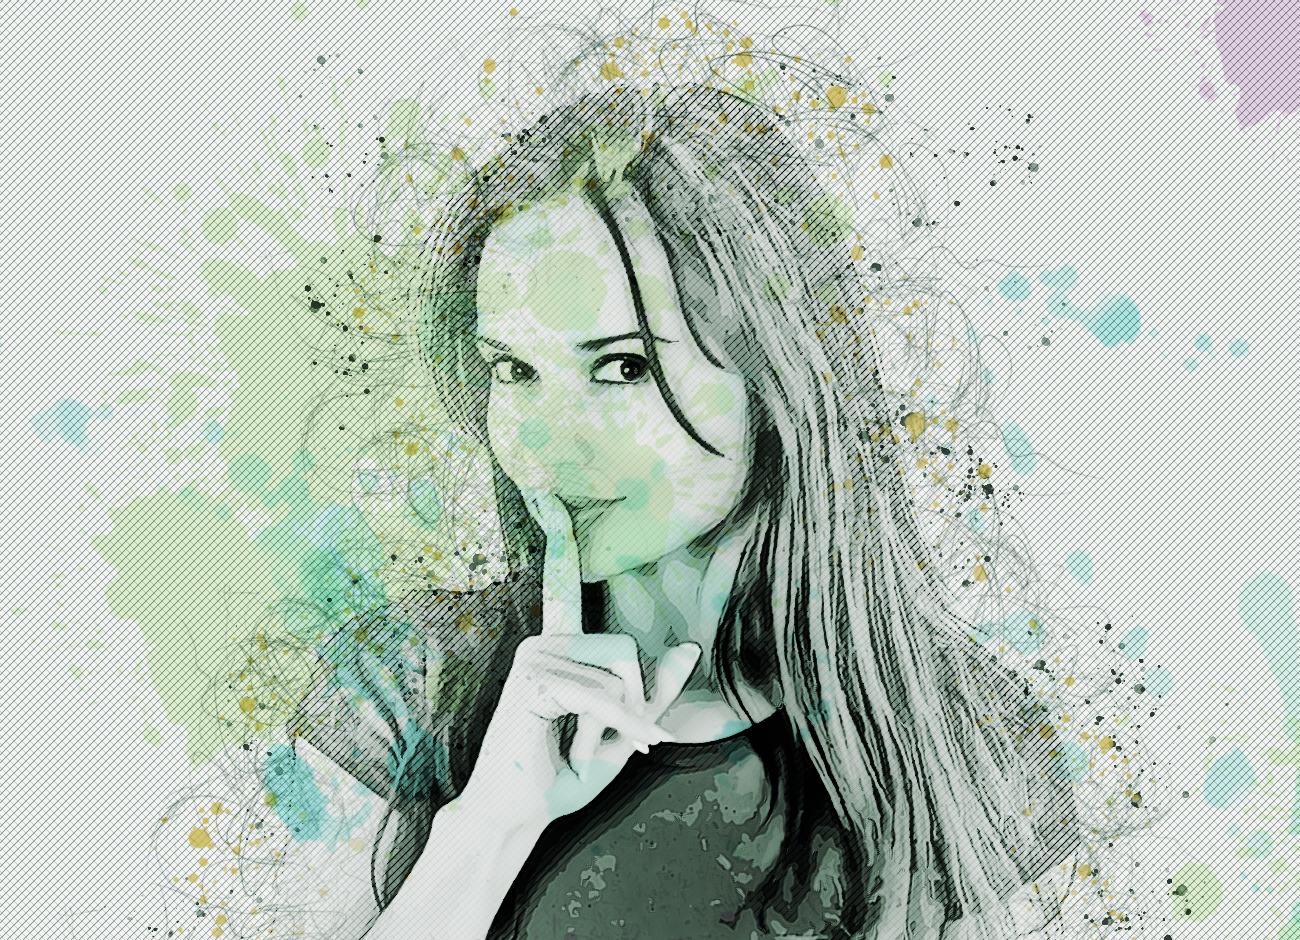 抽象铅笔素描效果照片处理特效PS动作模板 Abstract Sketch Photoshop Action插图8